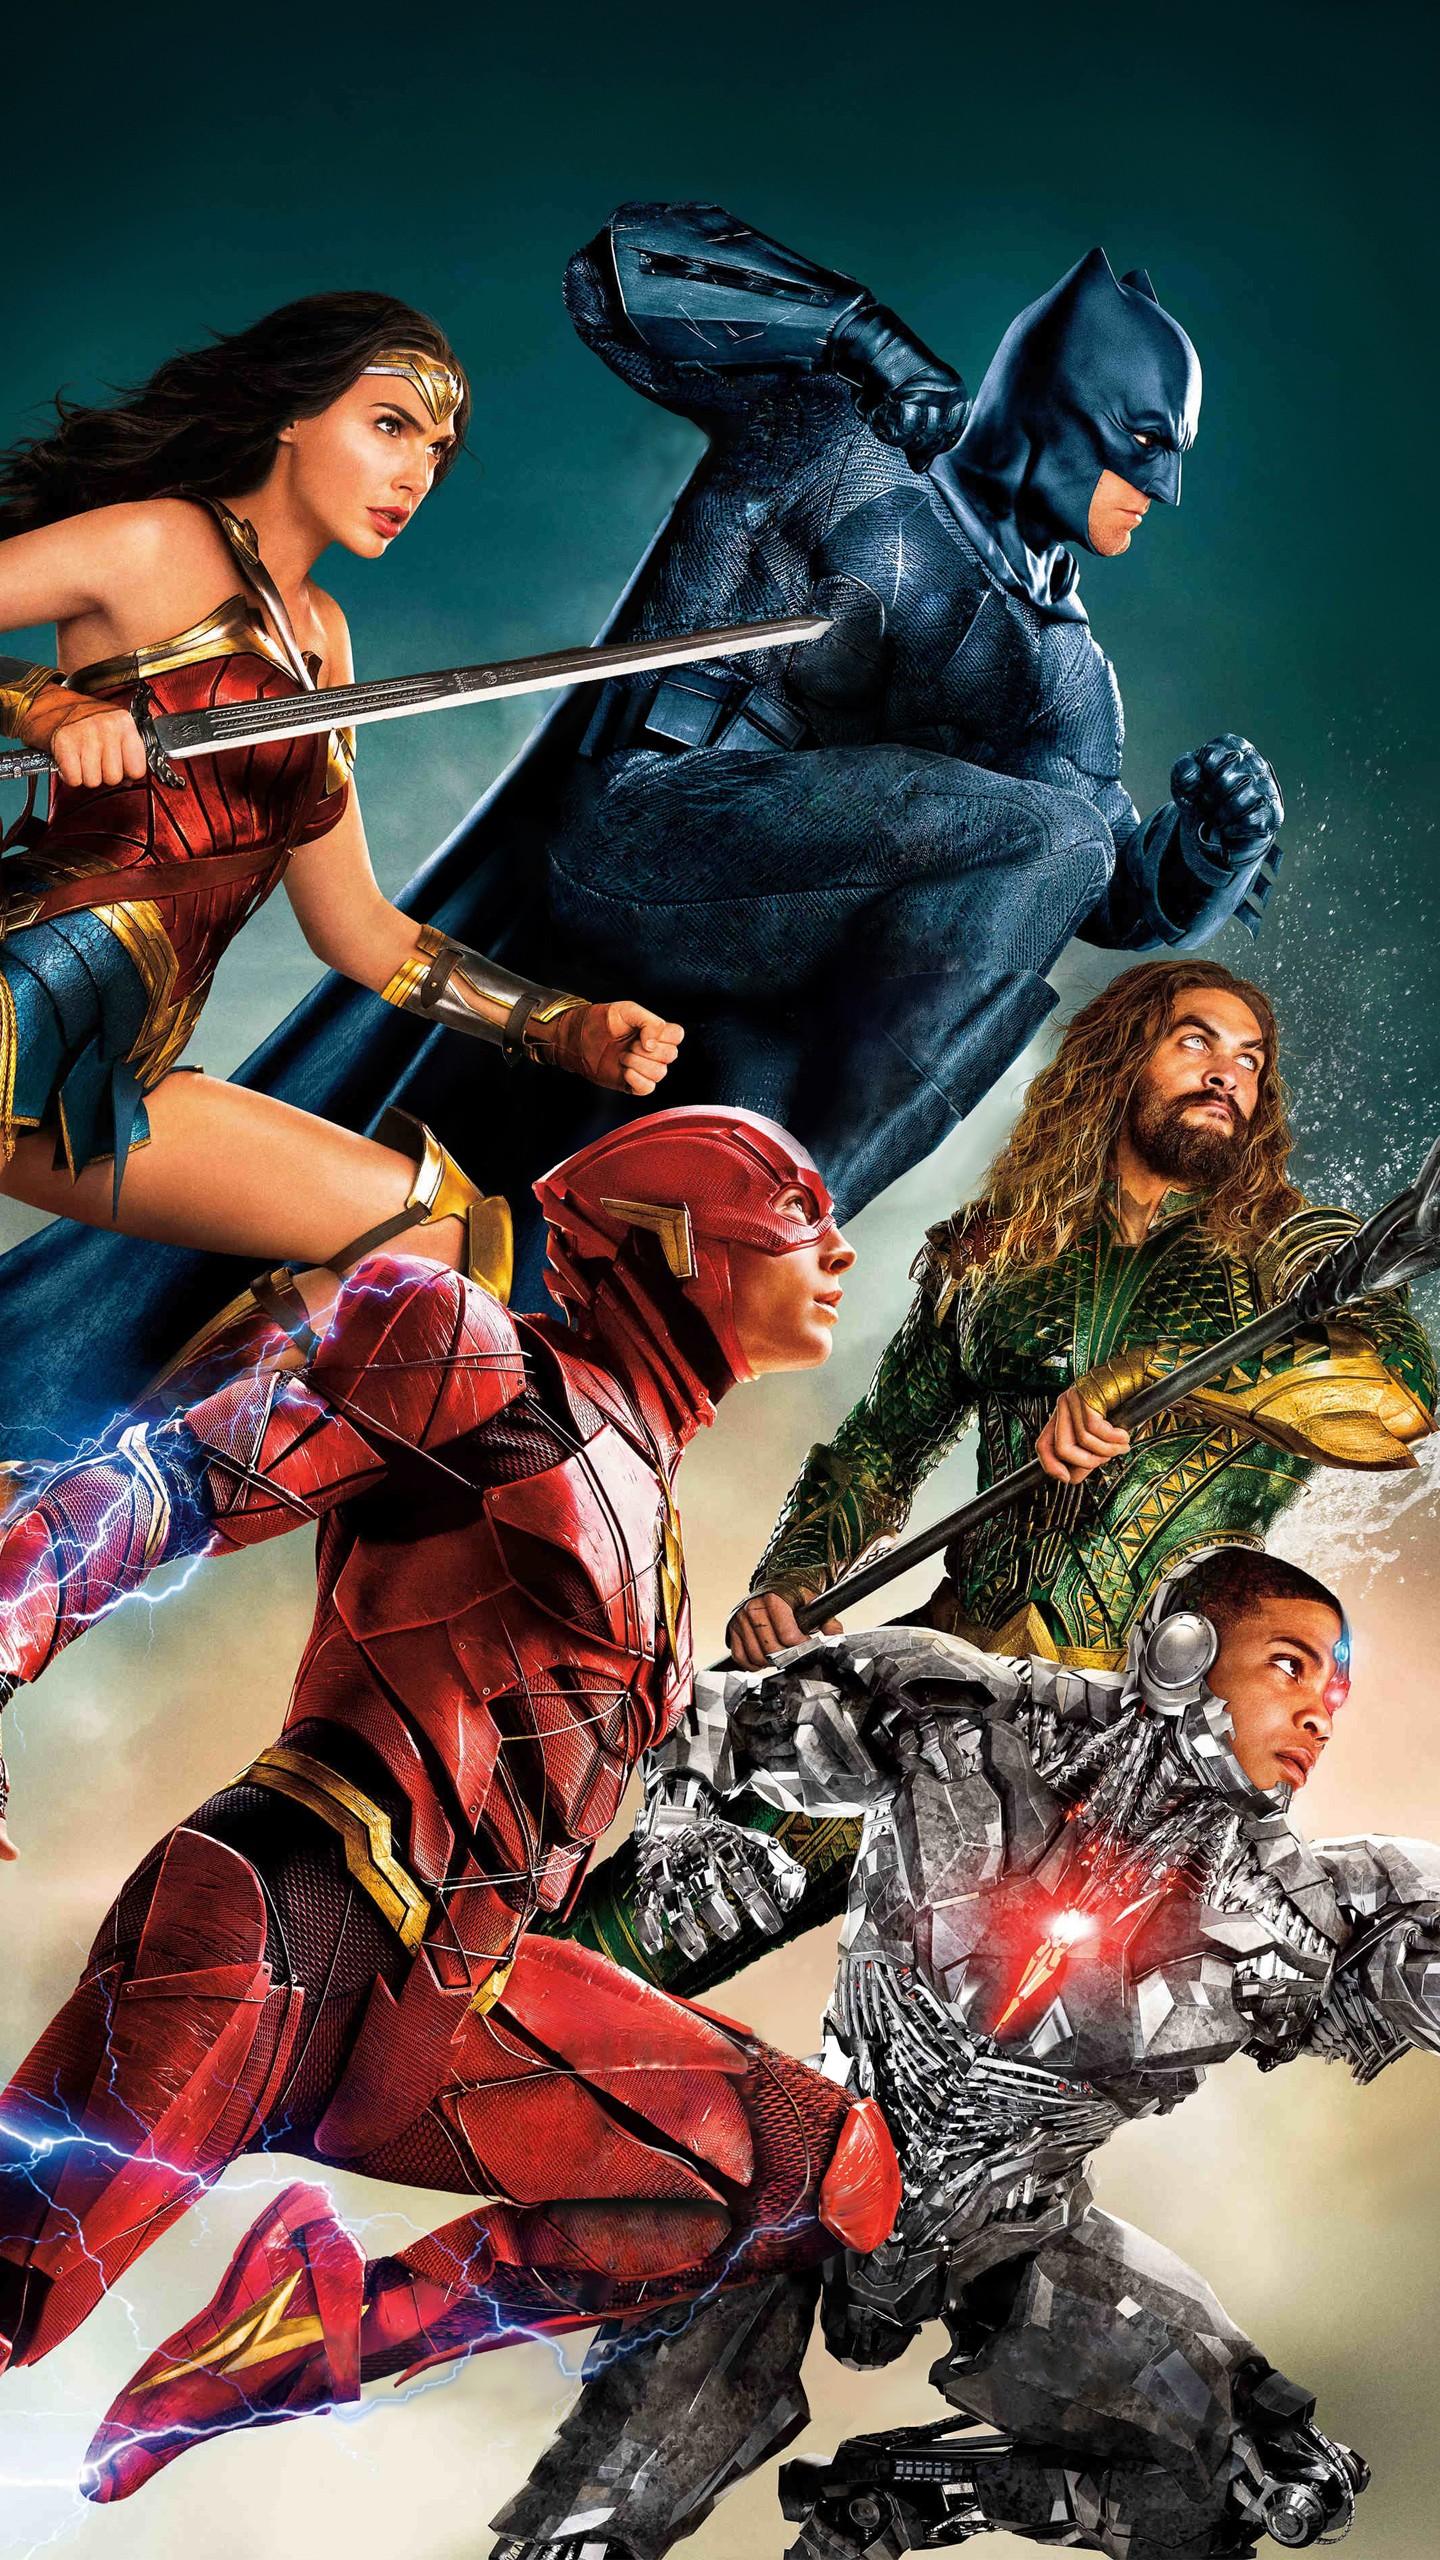 Iphone 5s Wallpaper 3d Justice League Superheroes 4k Wallpapers Hd Wallpapers